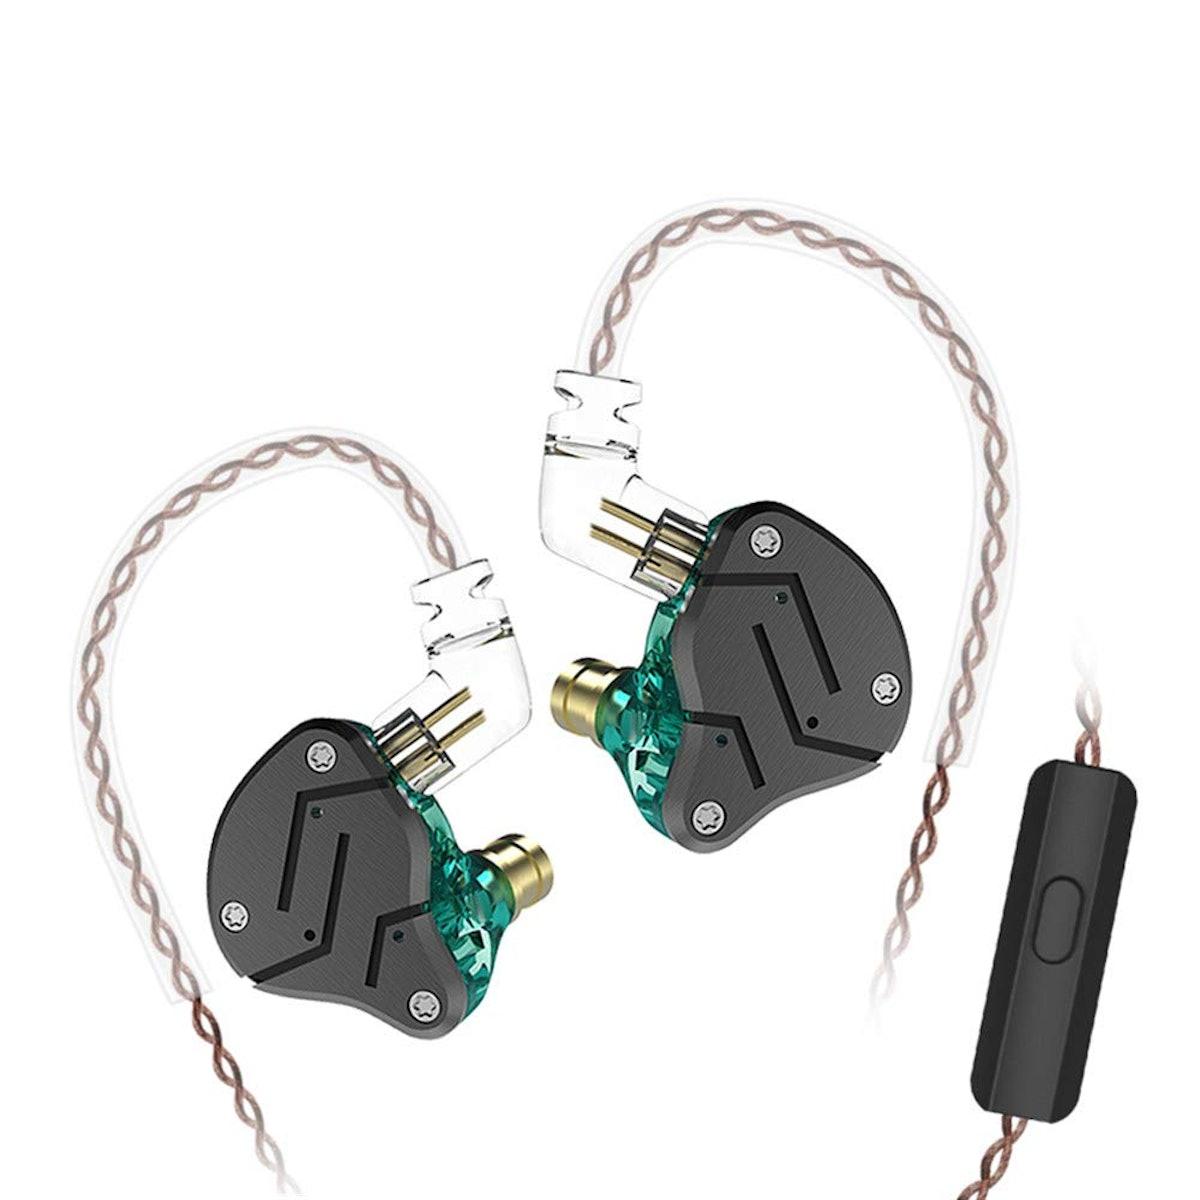 KZ ZSN Over Ear Earbuds Yinyoo HiFi Stereo Bass Sound IEM Headphones Noise Cancelling Earphone with ...